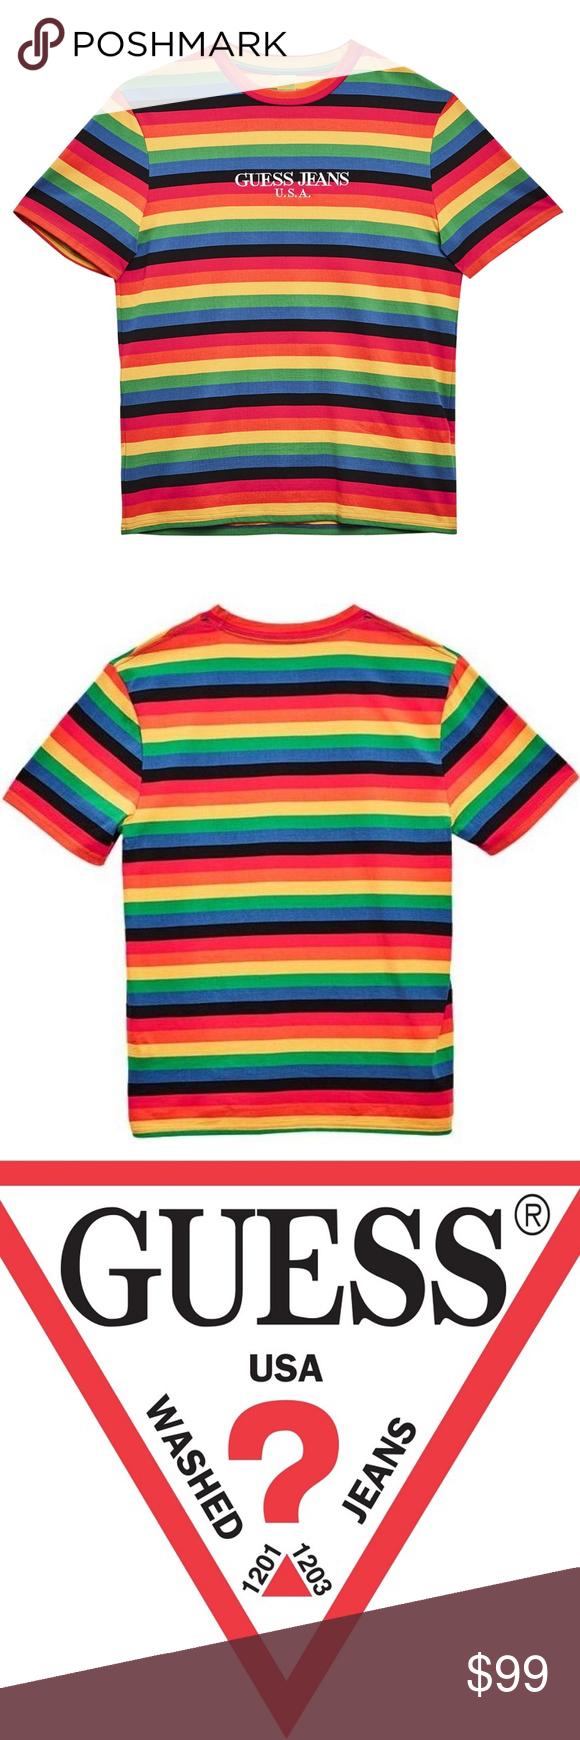 02b75a12d0a4 Guess Jeans Usa Farmers Market Logo Embroidered Cotton Jersey Sweatshirt